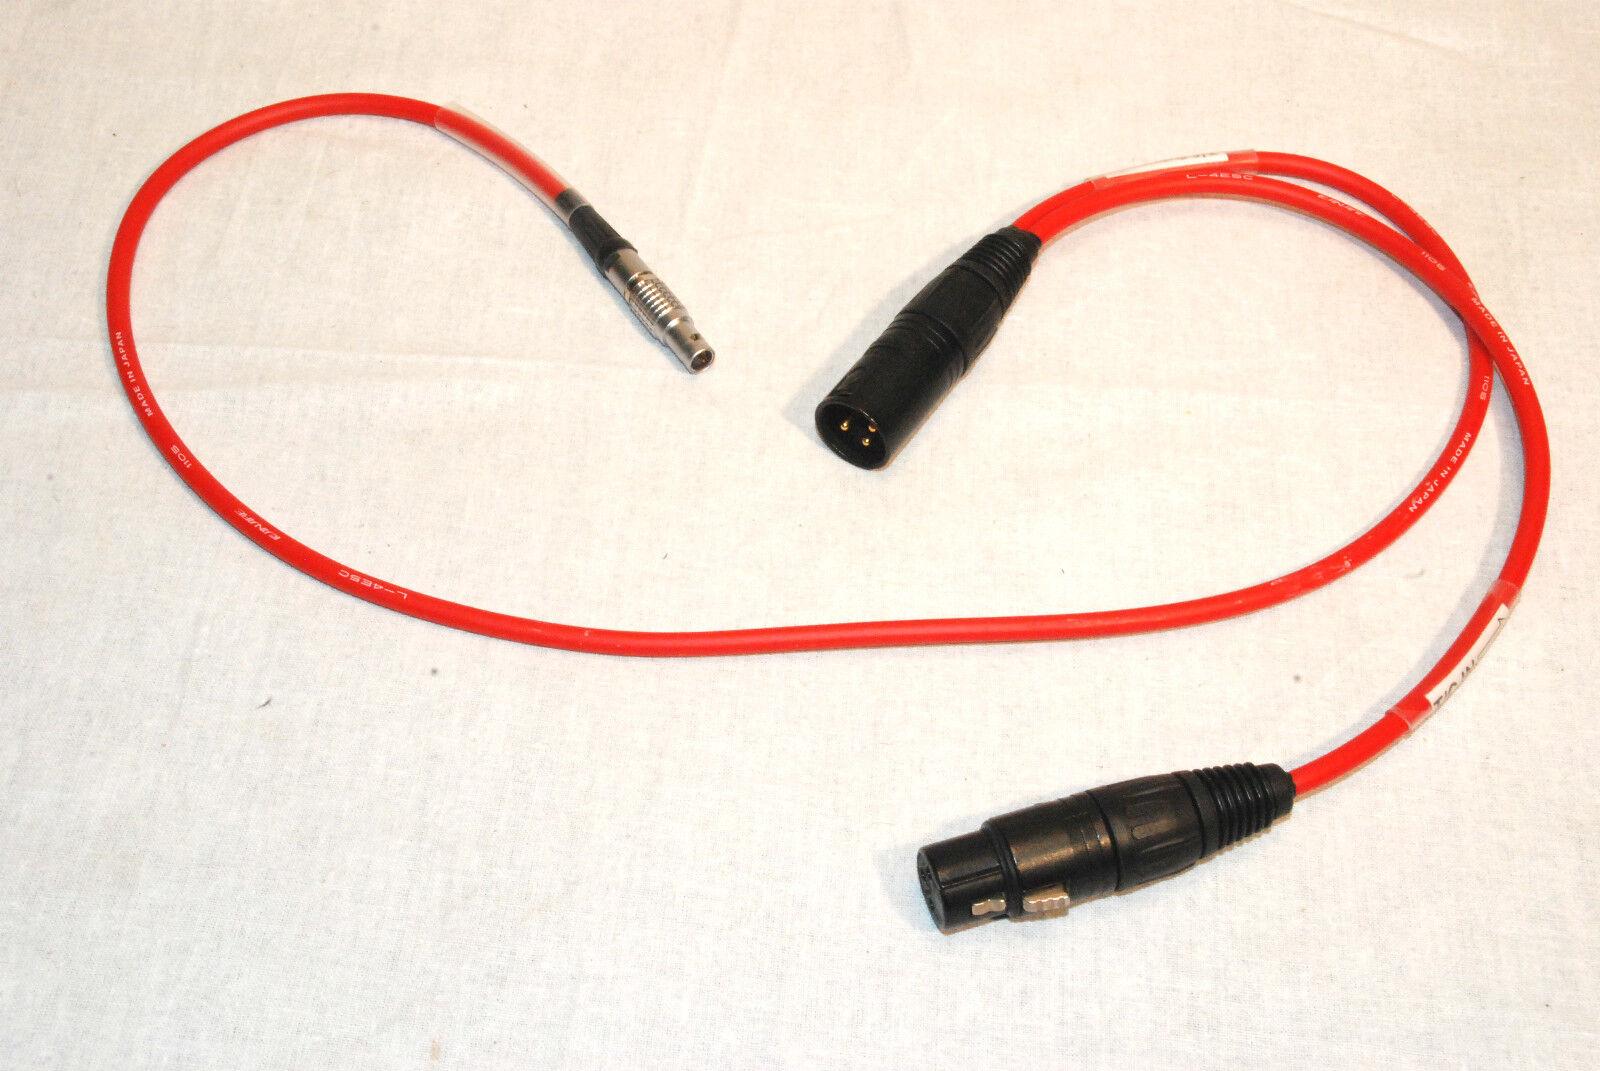 TIME CODE INPUT OUTPUT CABLE SOUND DEVICES ZAXCOM DENECKE LEMO 5 PIN TO XLR3'S